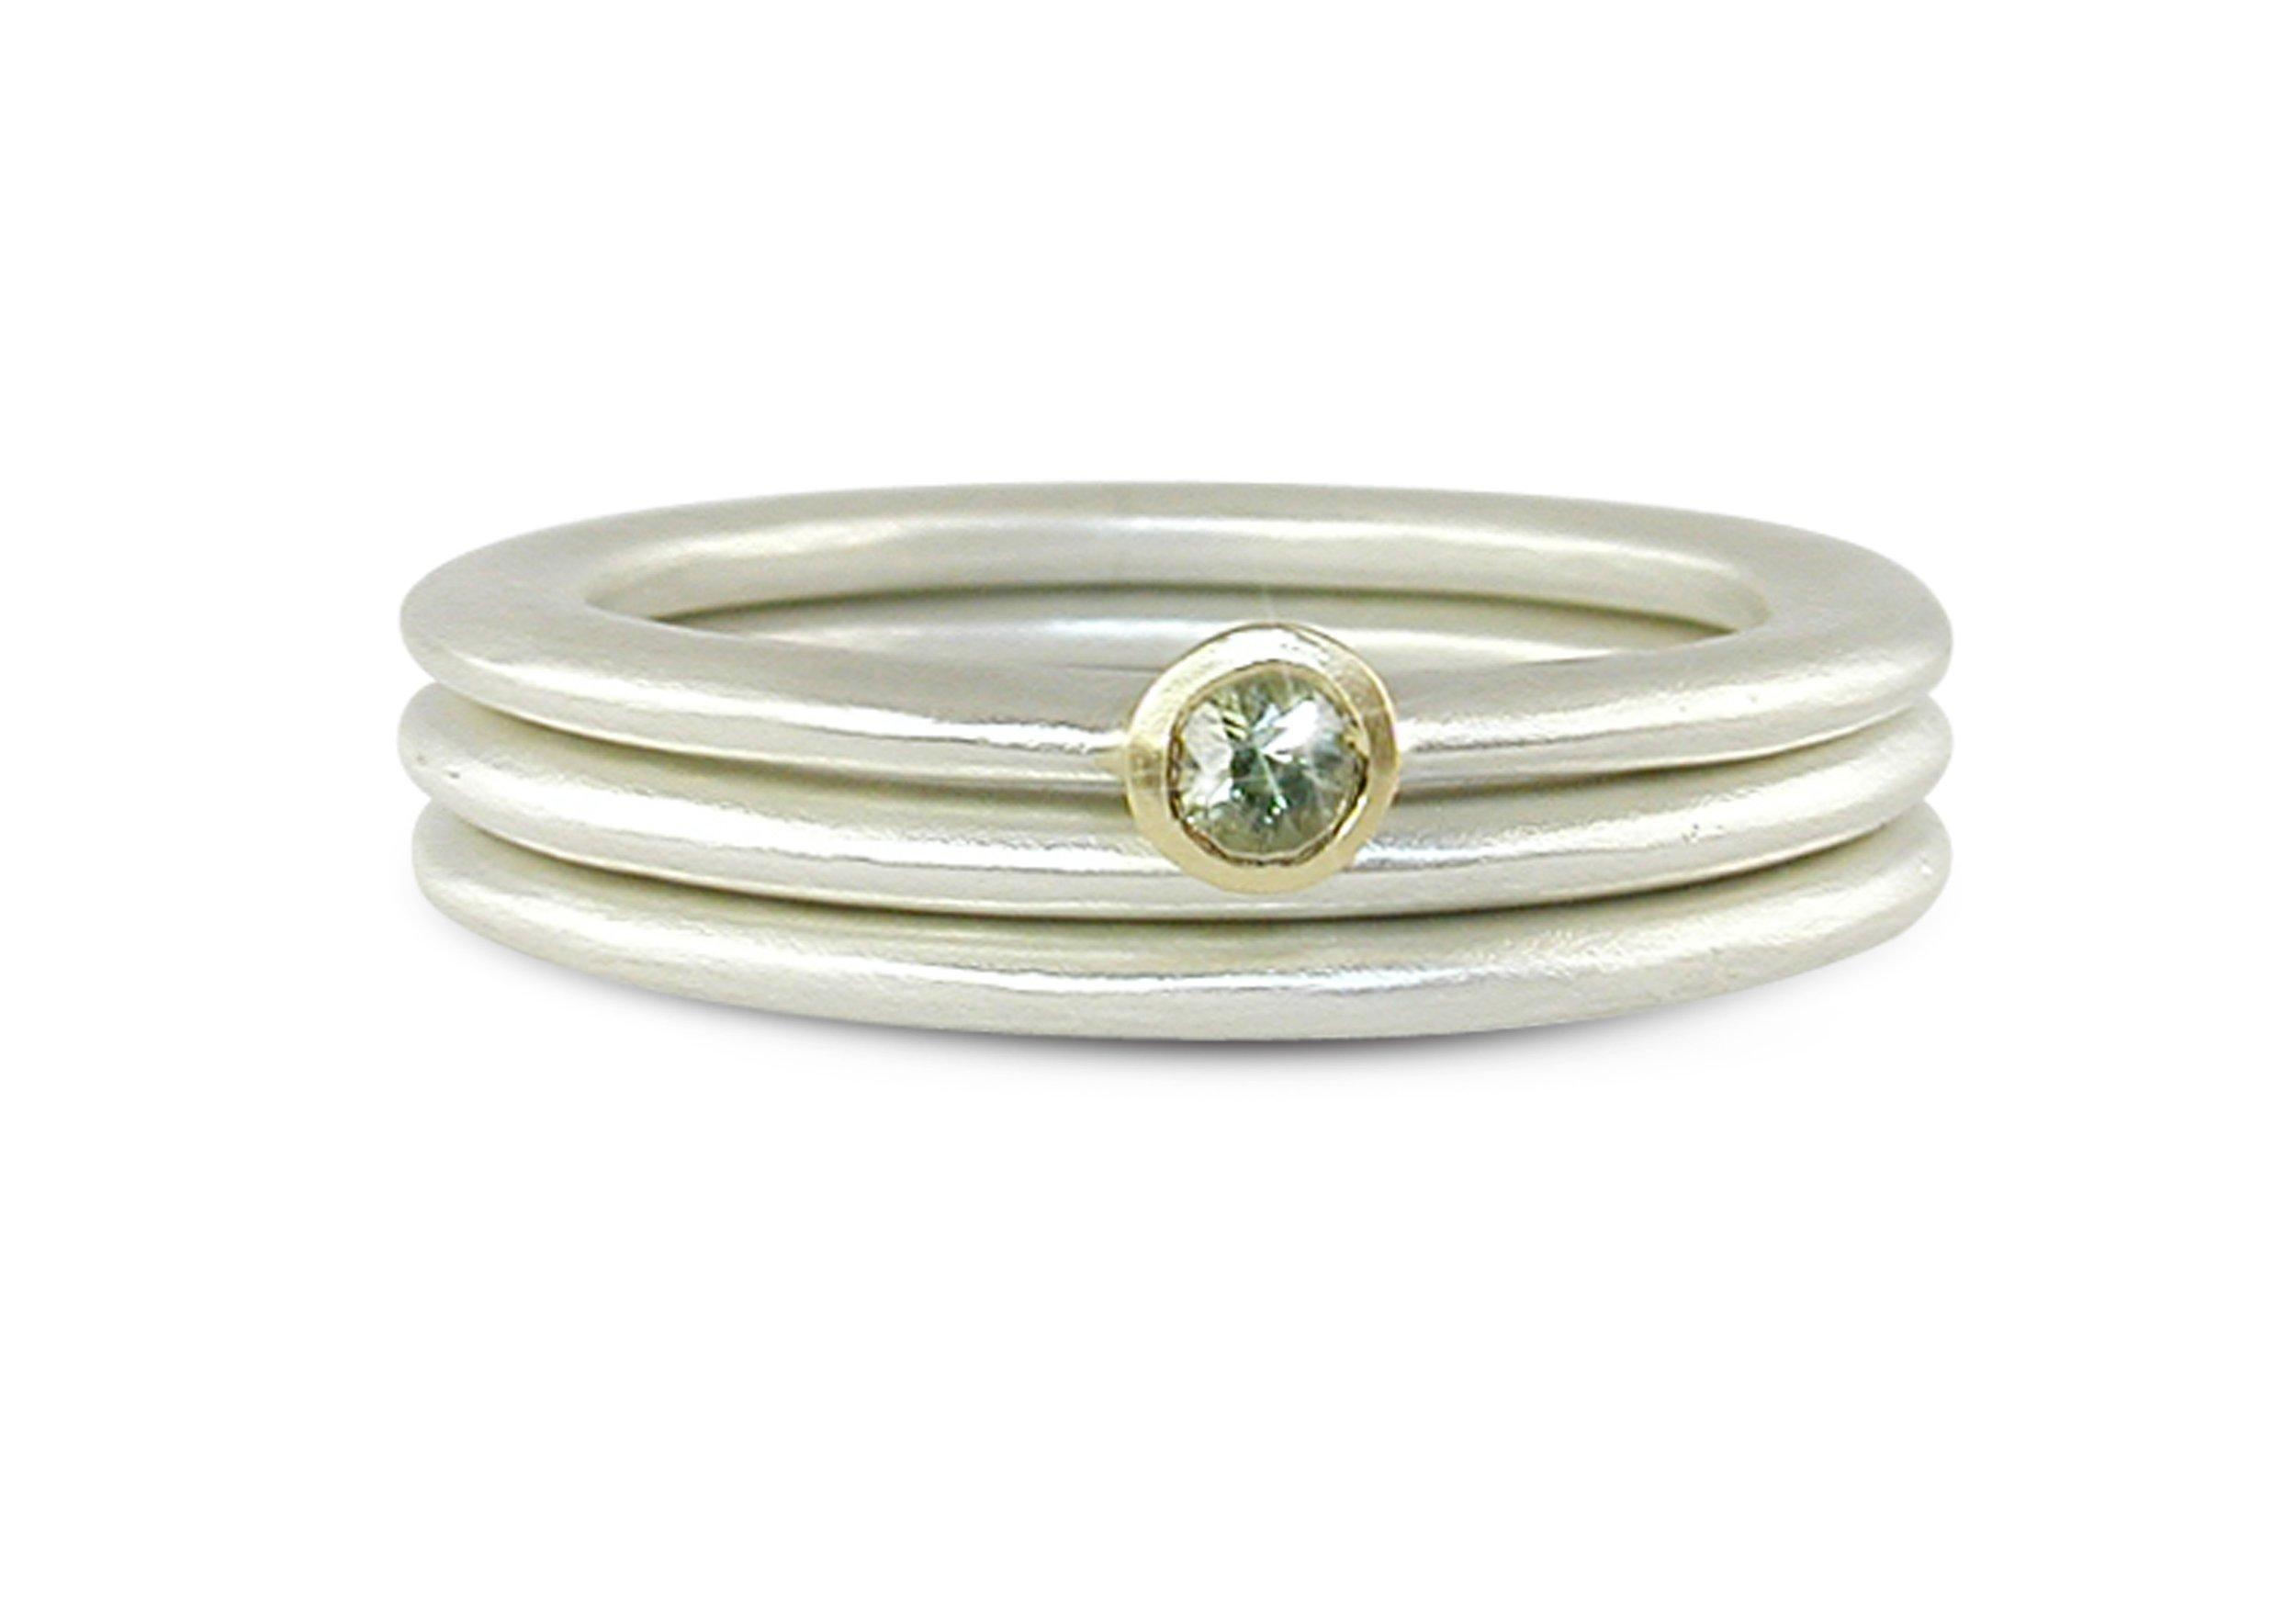 Orbital ring with green sa cropped.jpg